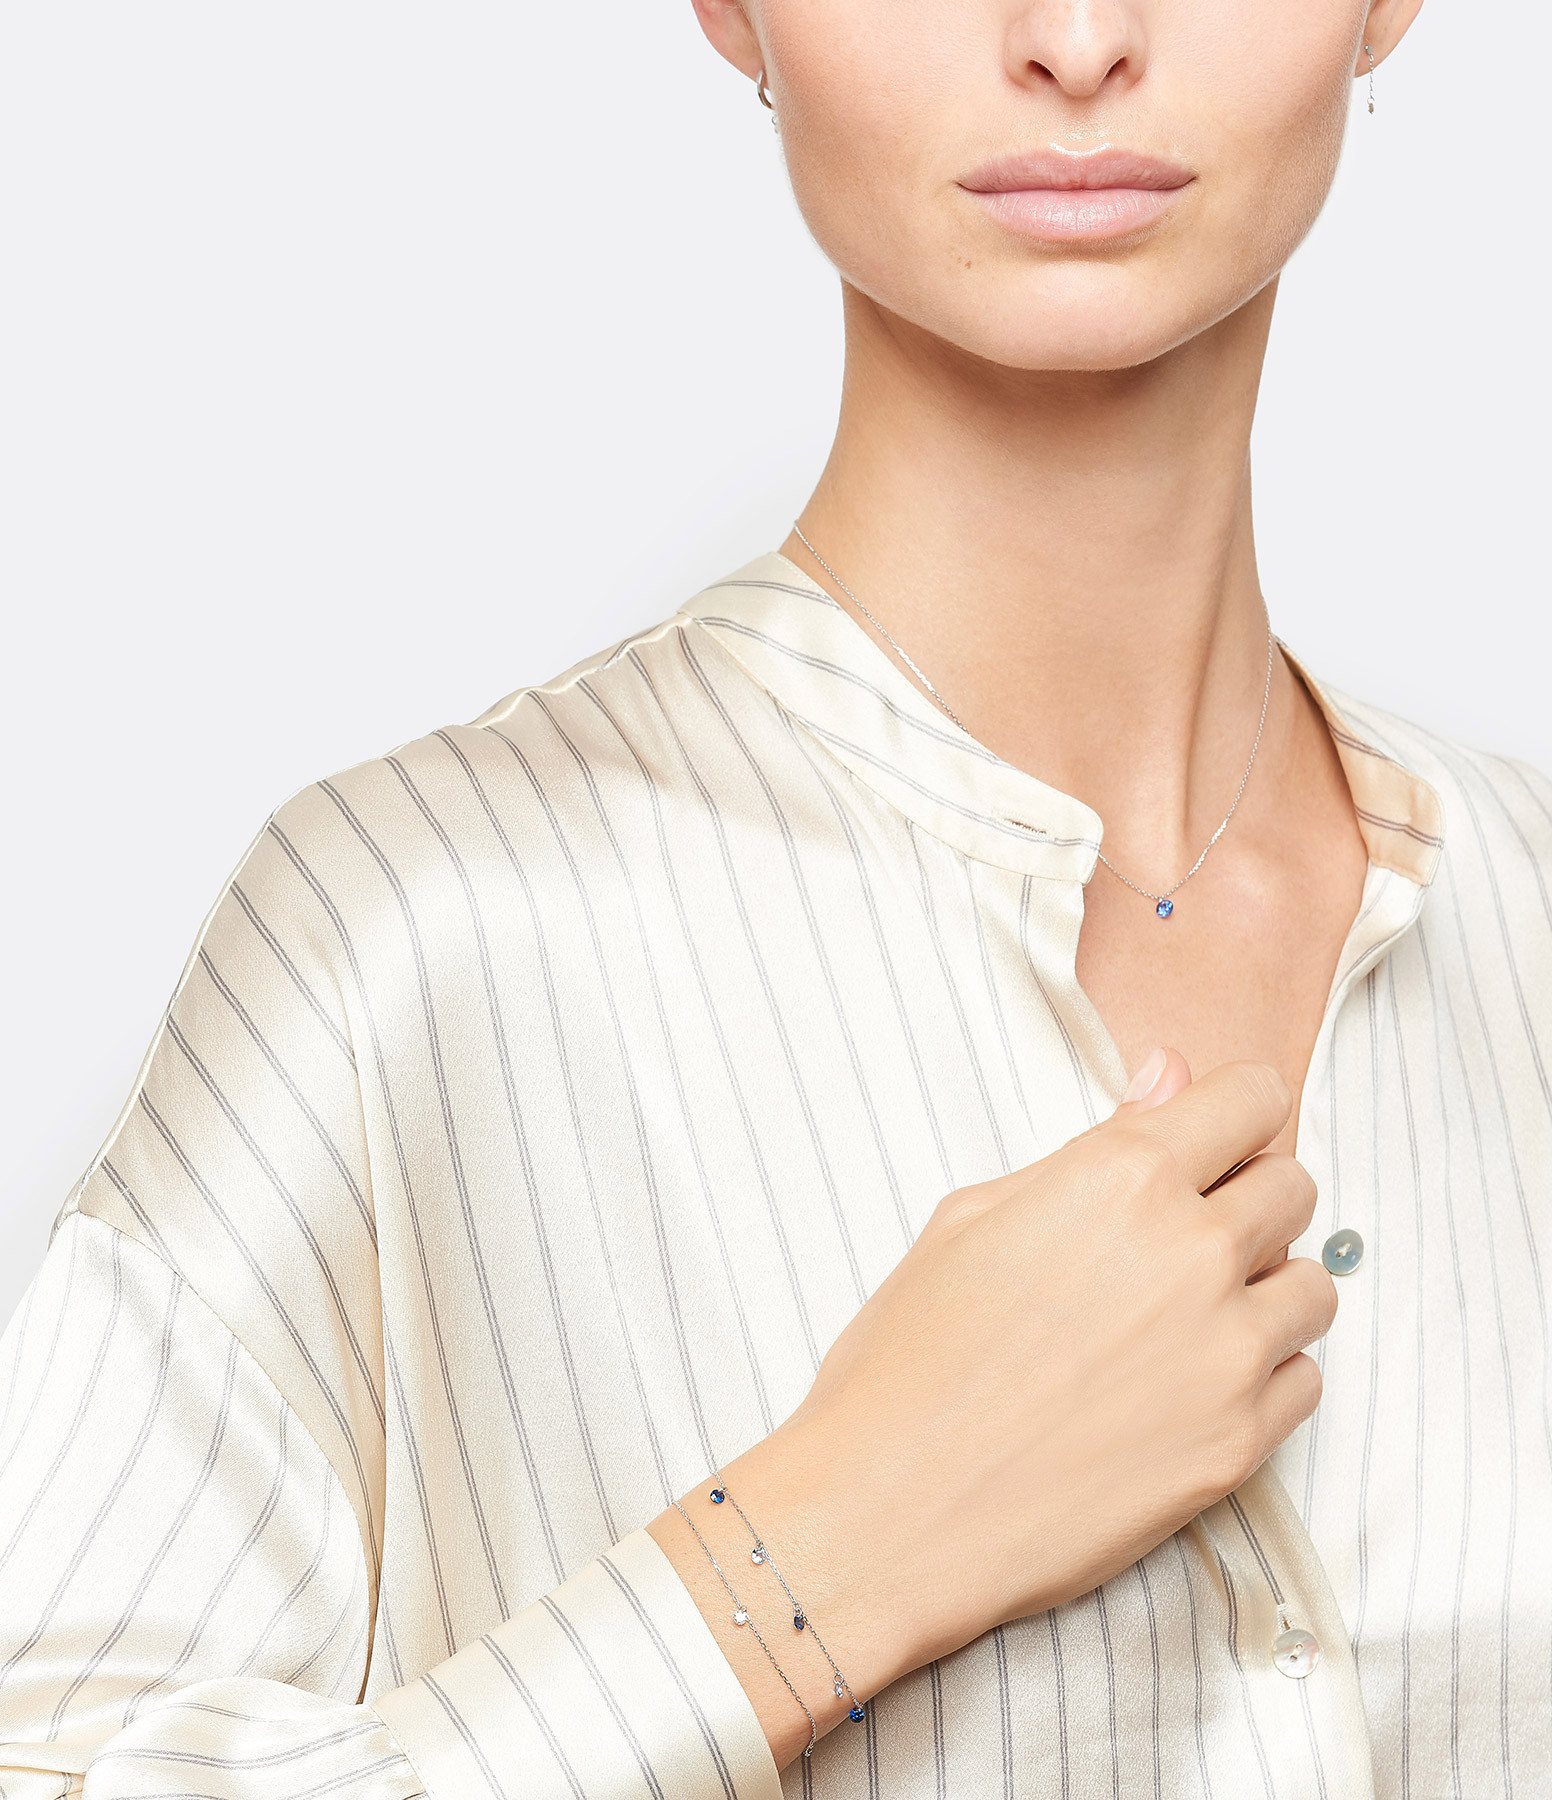 LA BRUNE & LA BLONDE - Bracelet 360° Diamant Brillant 0,10 Or Blanc